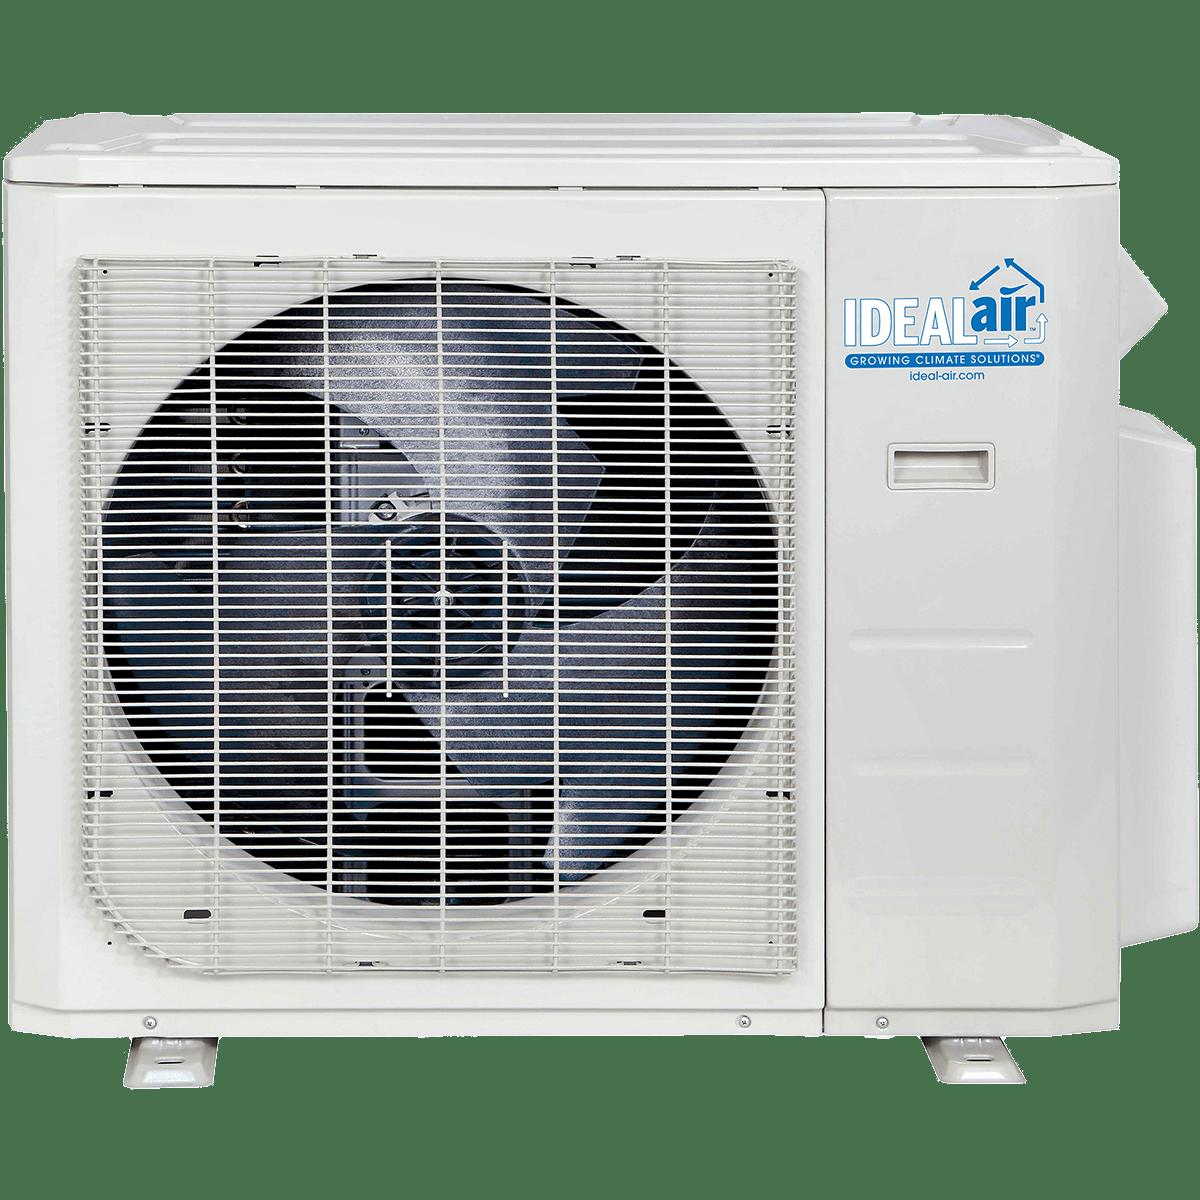 Diagram Air Ease Heat Pump Thermostat Wiring Diagram